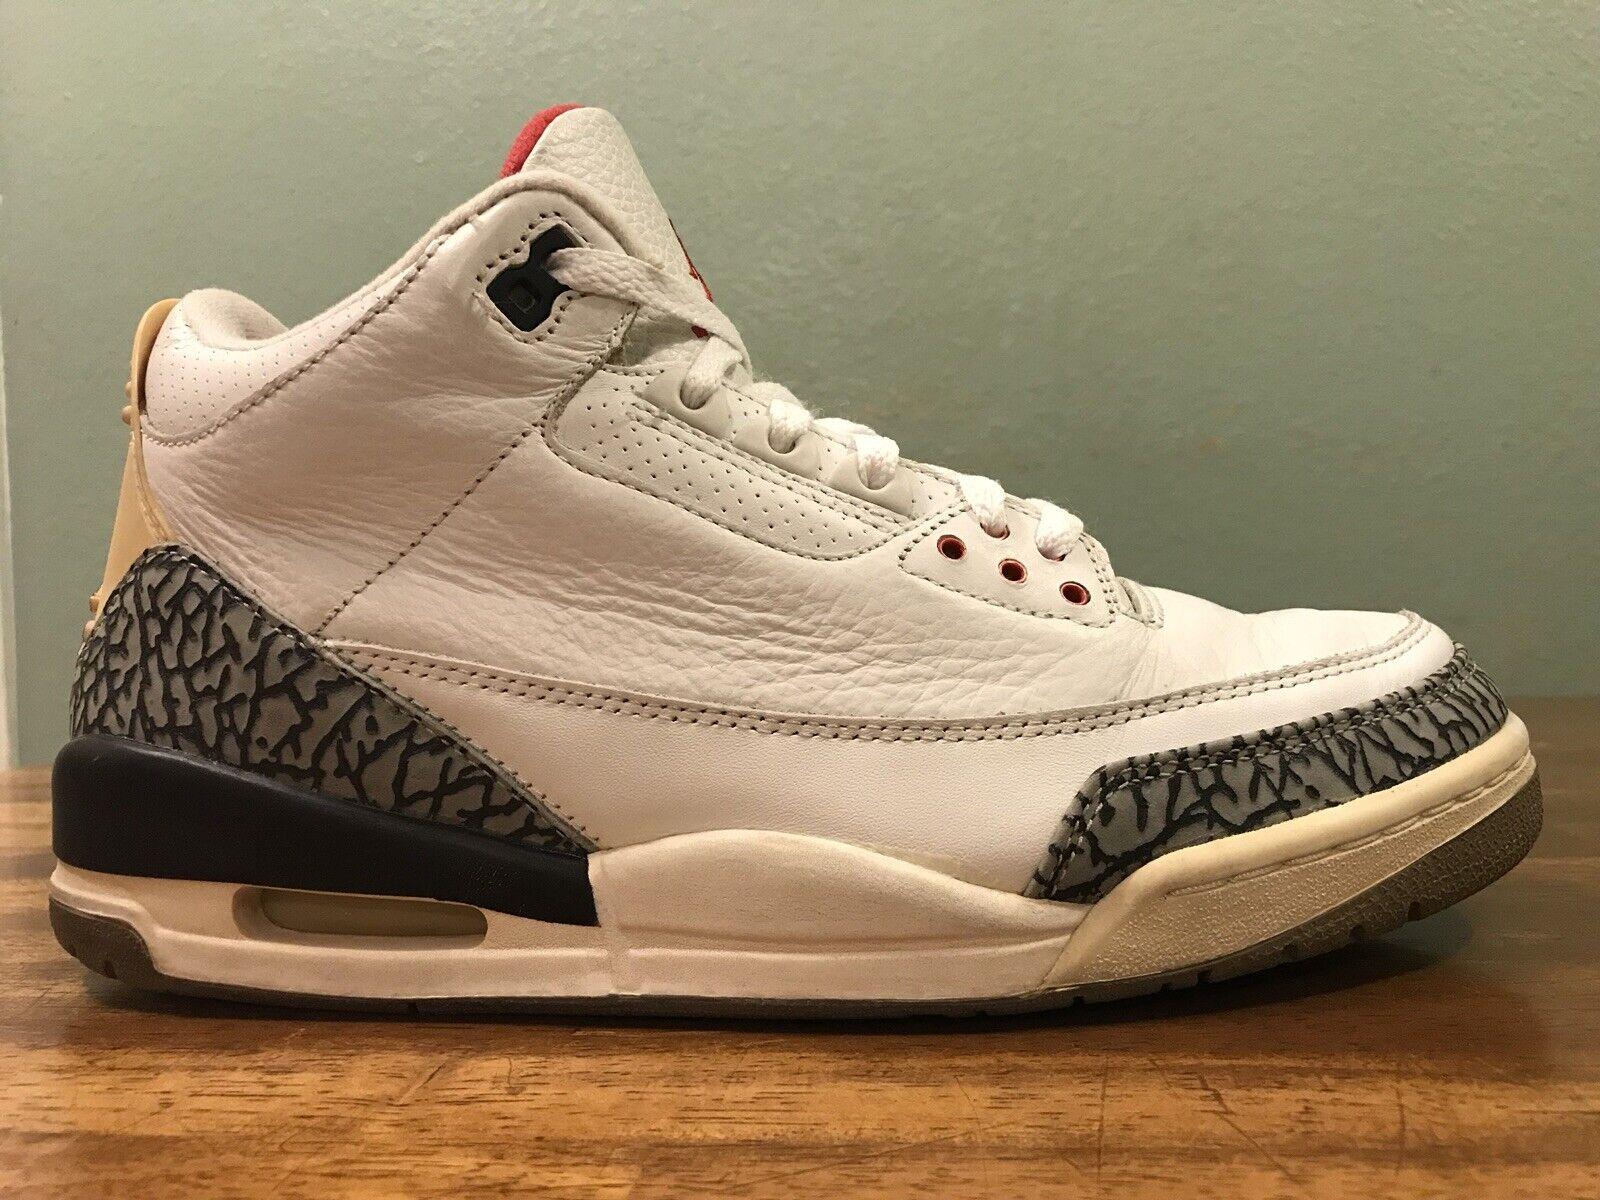 2003 Nike Air Jordan III 3 Retro White Cement Grey Fire Red Black Men's Size 9.5